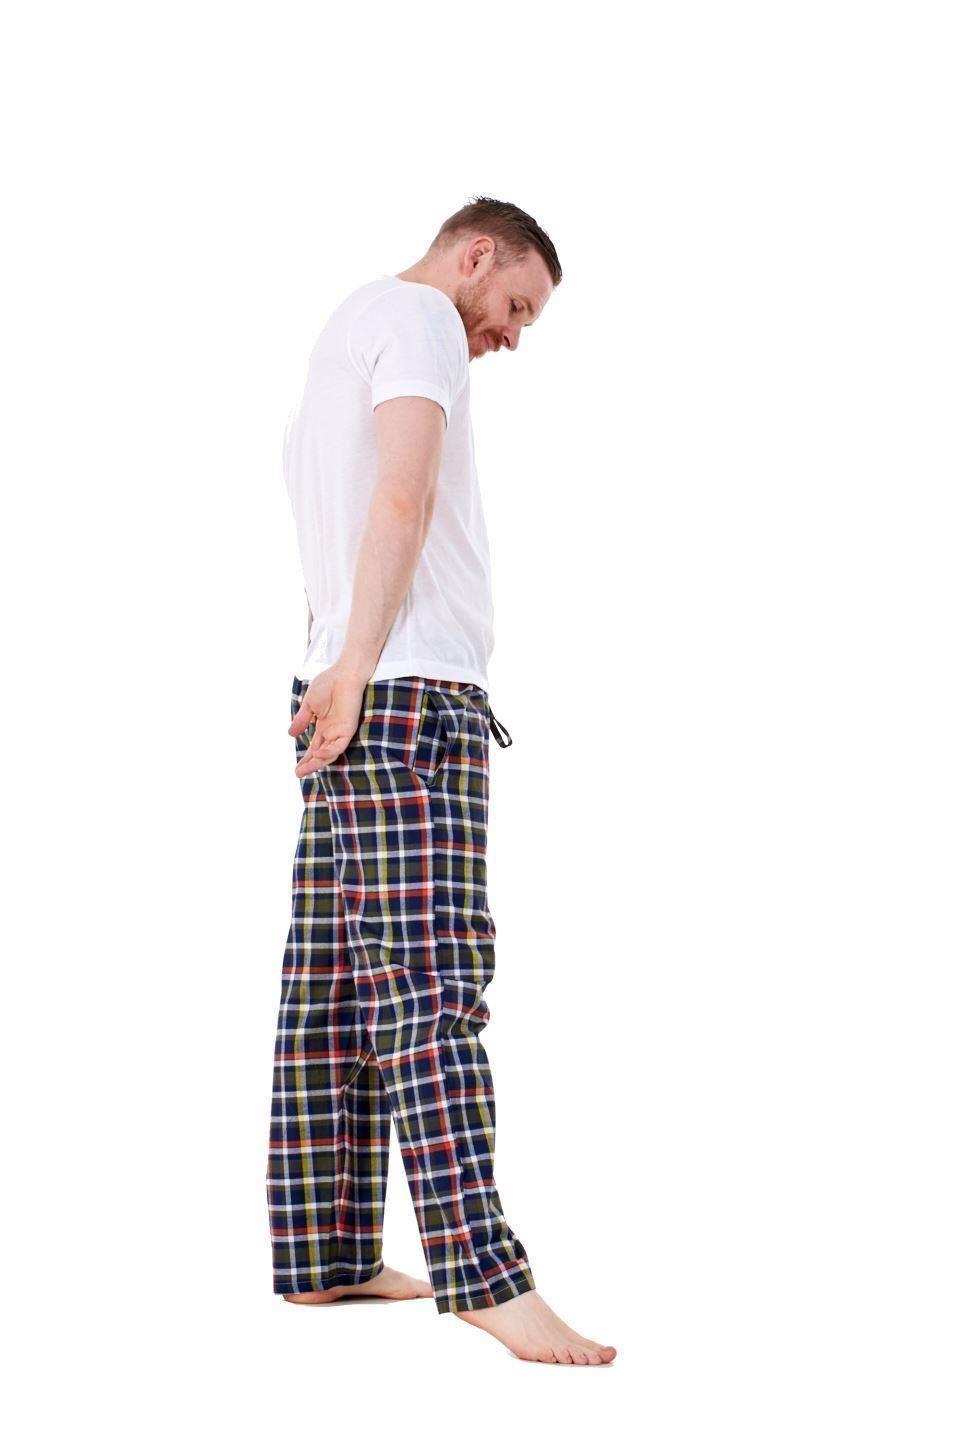 Mens-Pyjama-Bottoms-Rich-Cotton-Woven-Check-Lounge-Pant-Nightwear-Big-3XL-to-5XL Indexbild 38